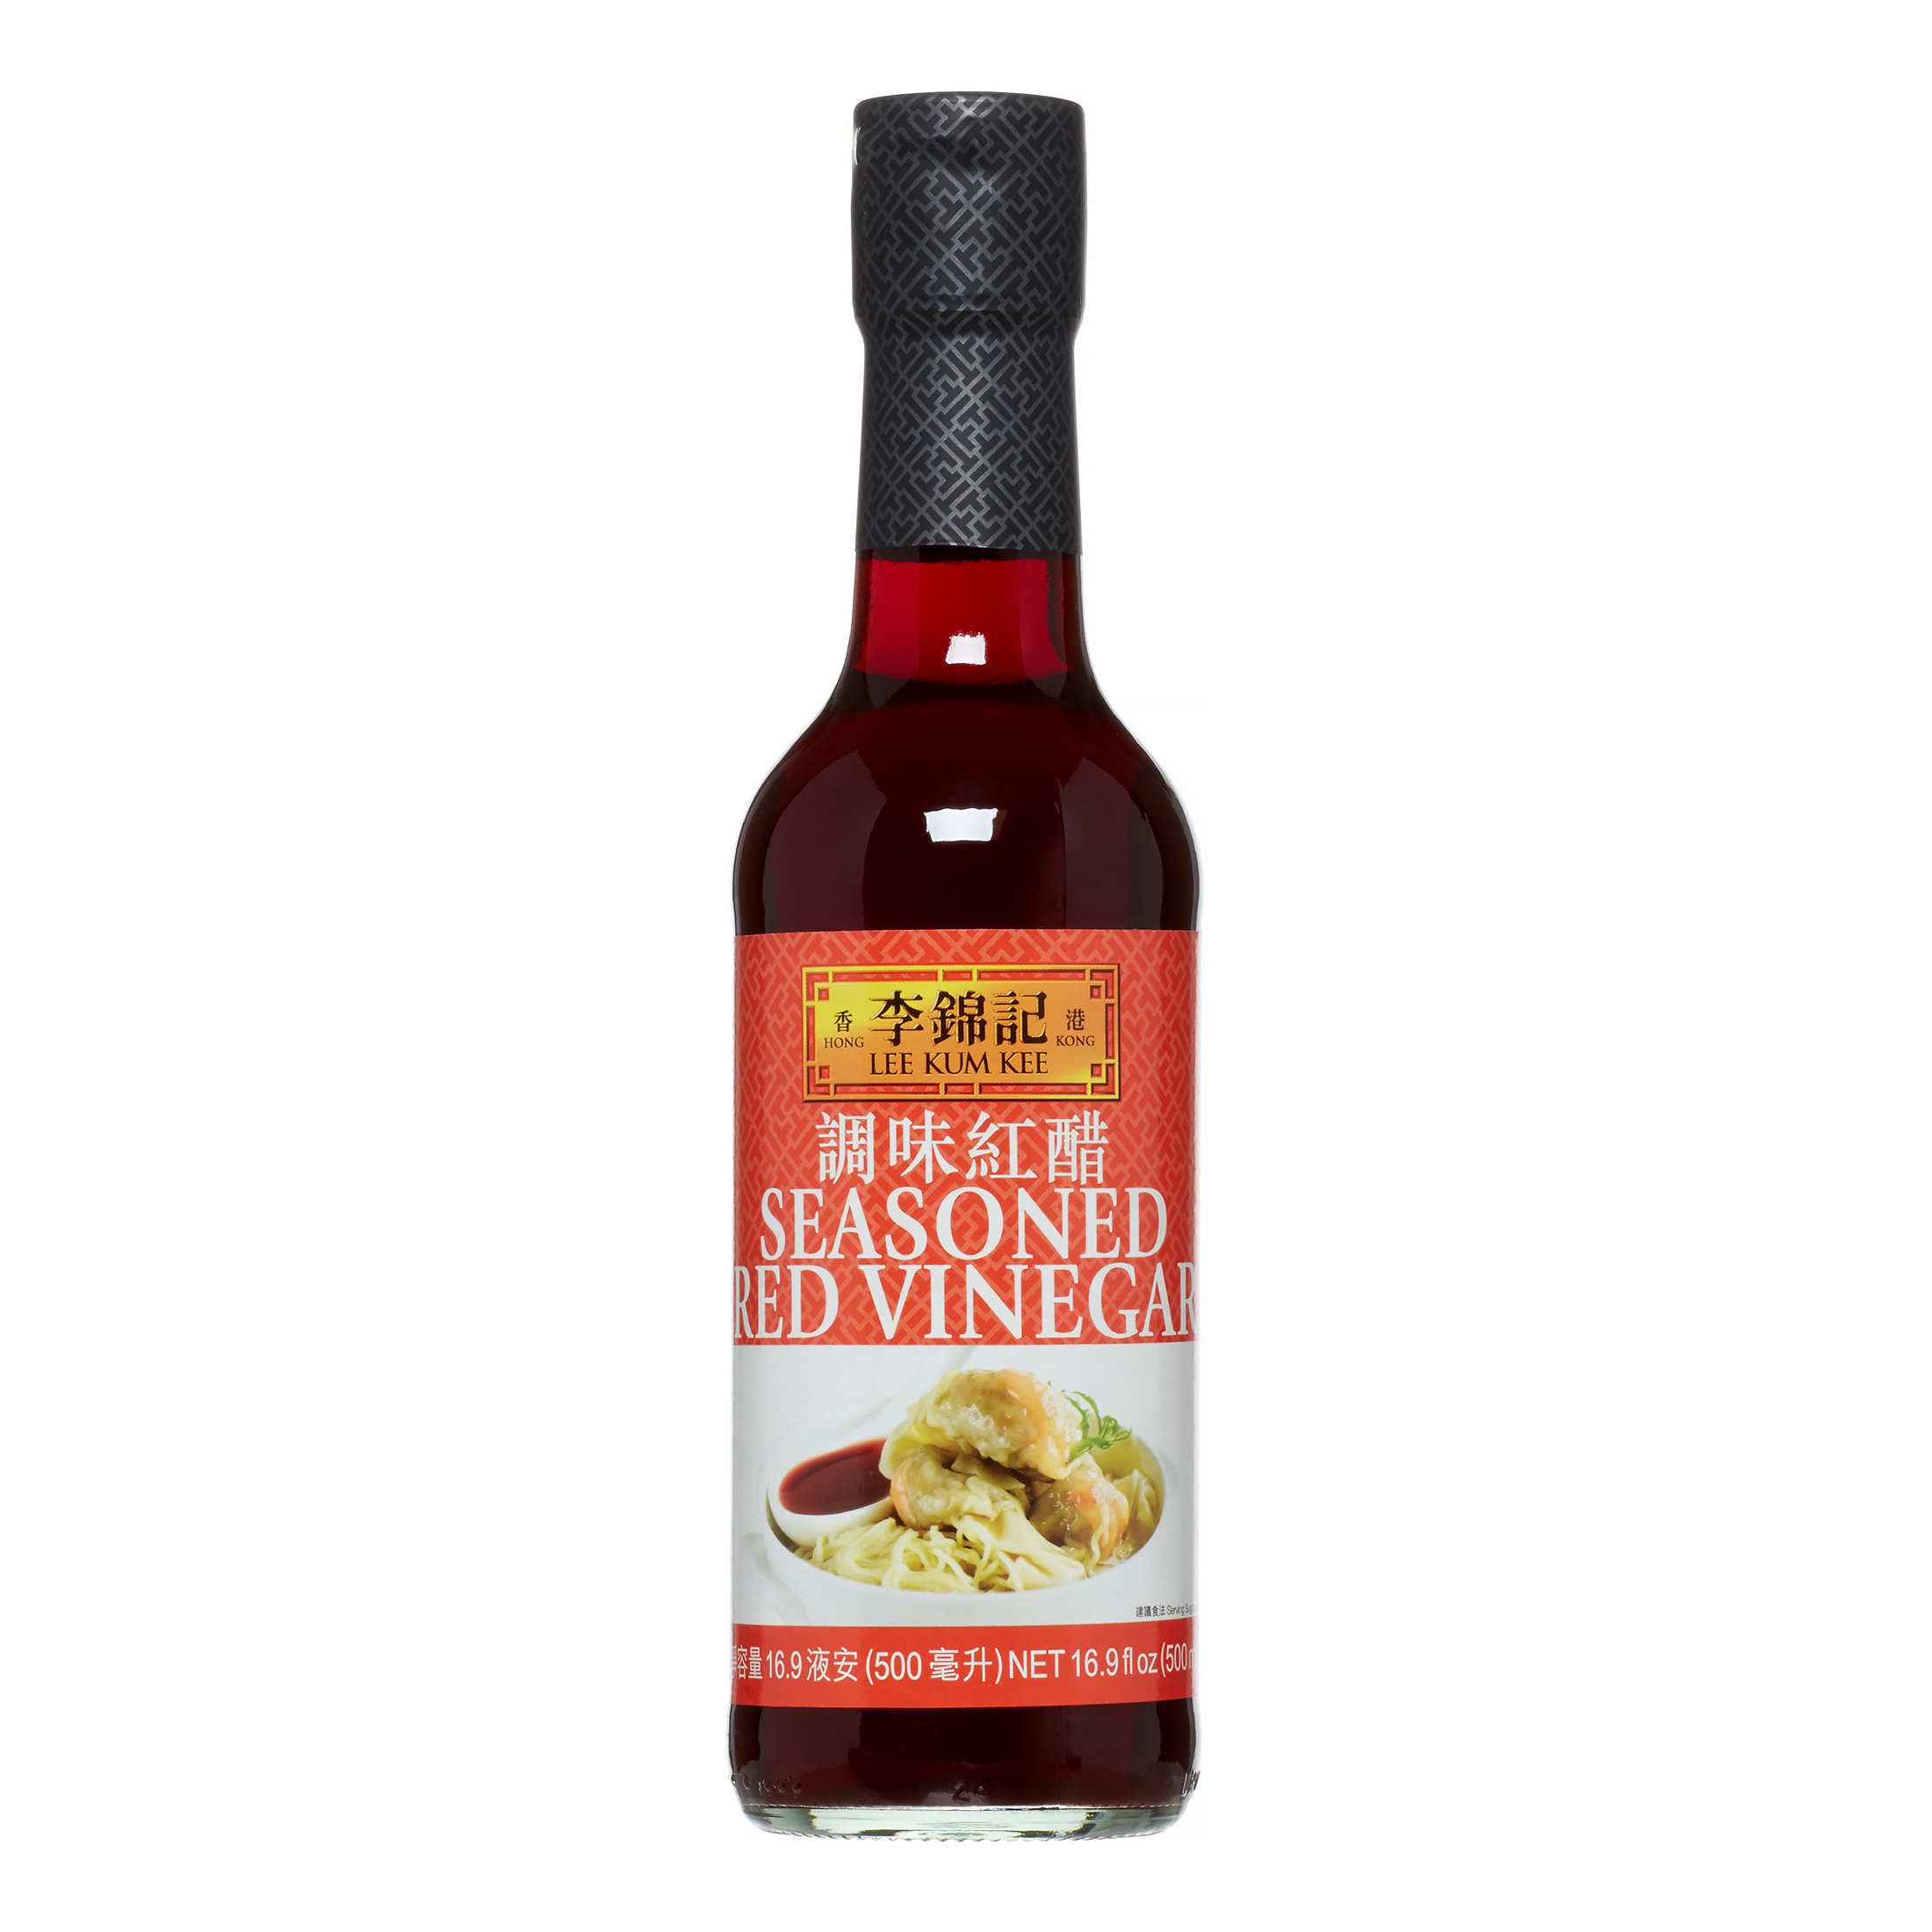 medium lee kum kee red vinegar seasoning 169 fl oz zJTSWq3Zs